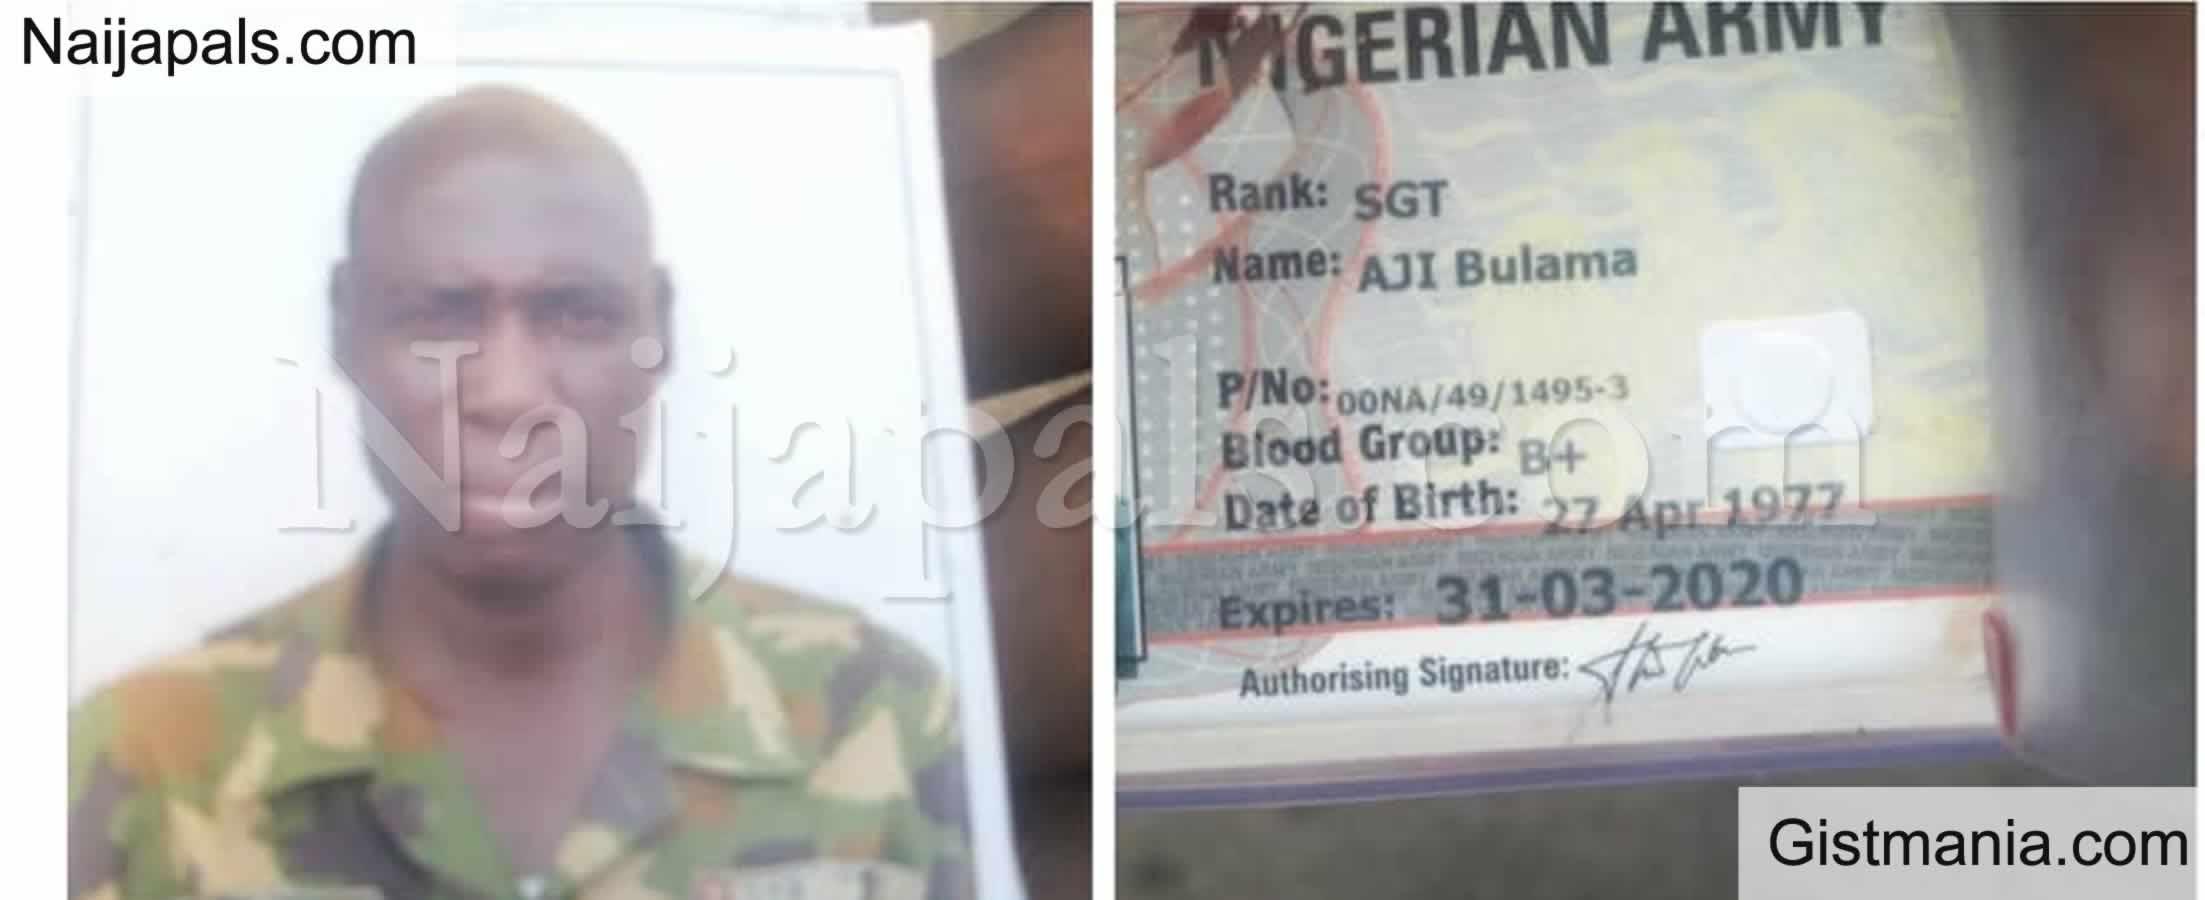 <img alt='.' class='lazyload' data-src='https://img.gistmania.com/emot/shocked.gif' /><img alt='.' class='lazyload' data-src='https://img.gistmania.com/emot/photo.png' /> <b>Gunmen Shot Dead Soldier During An Attack On A Commercial Bus In Enugu</b> (PHOTOS)